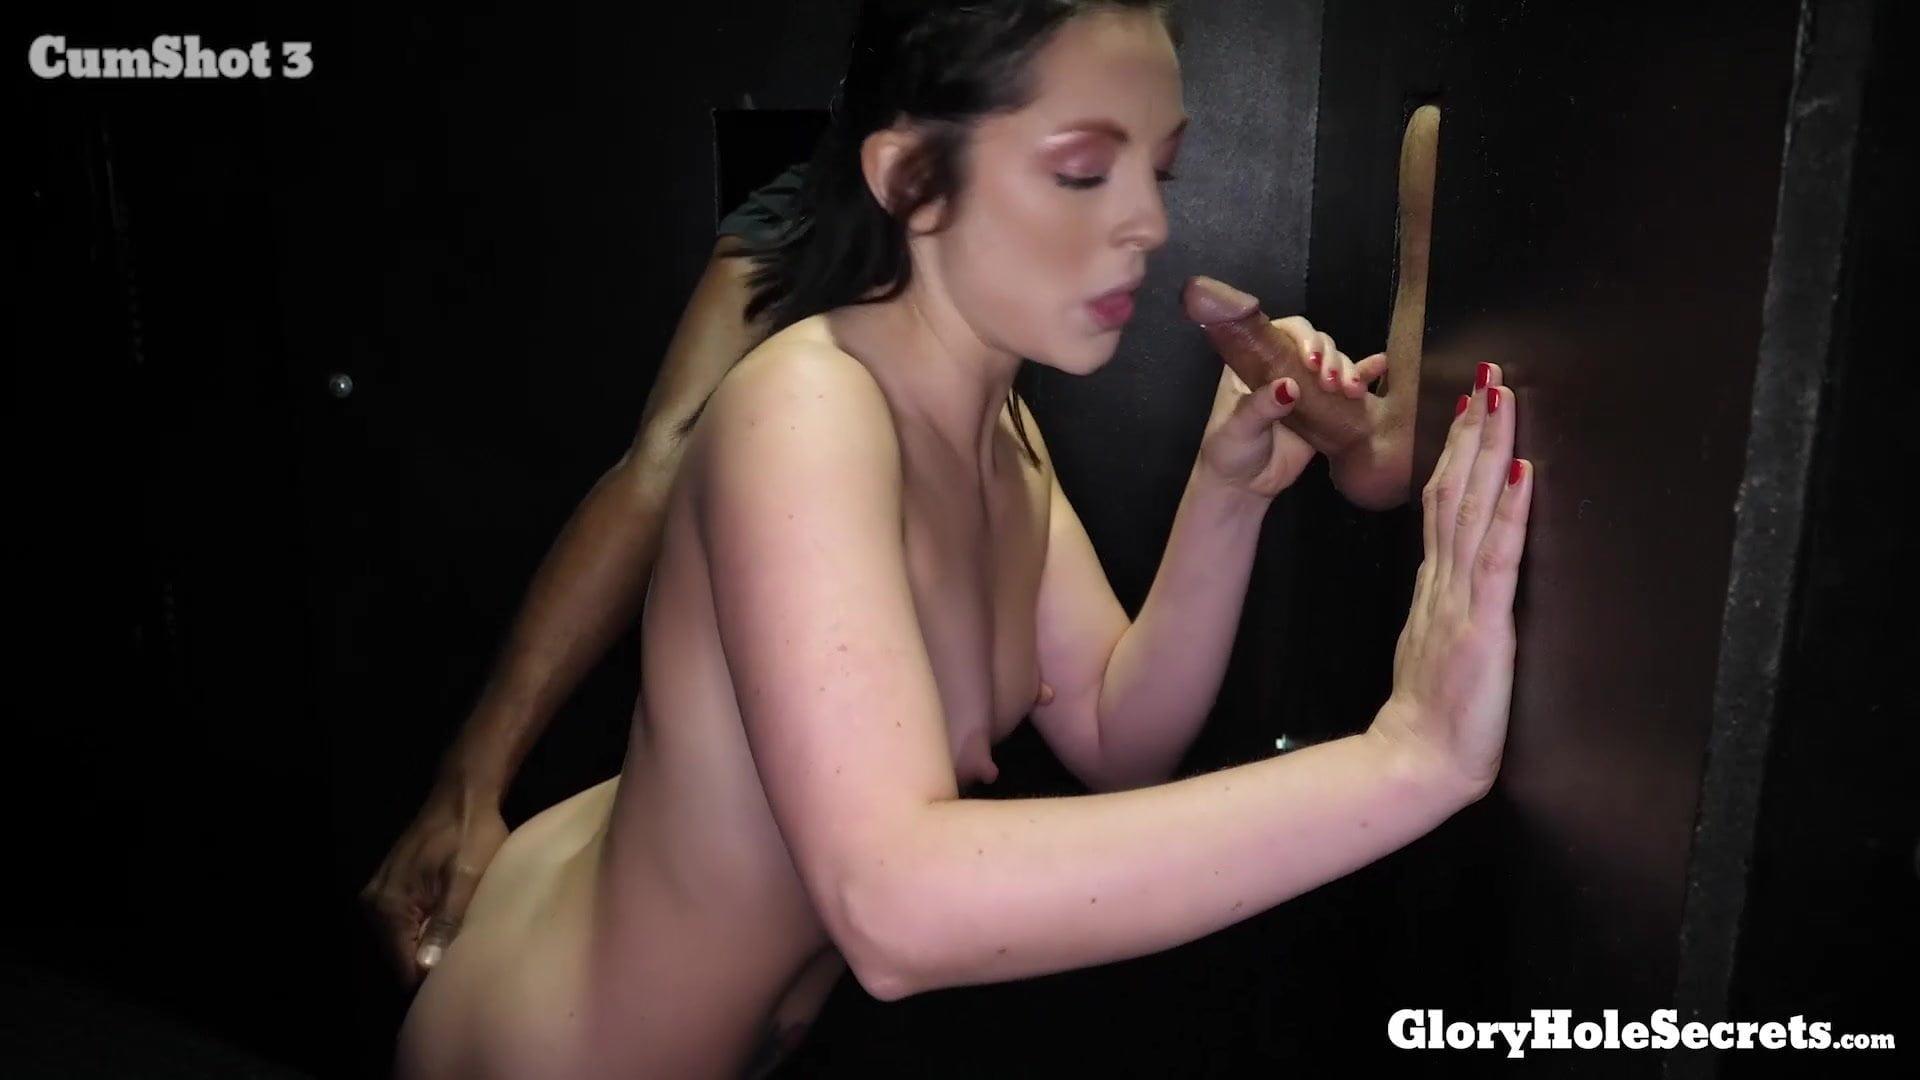 Jennifer aniston nude marley and me